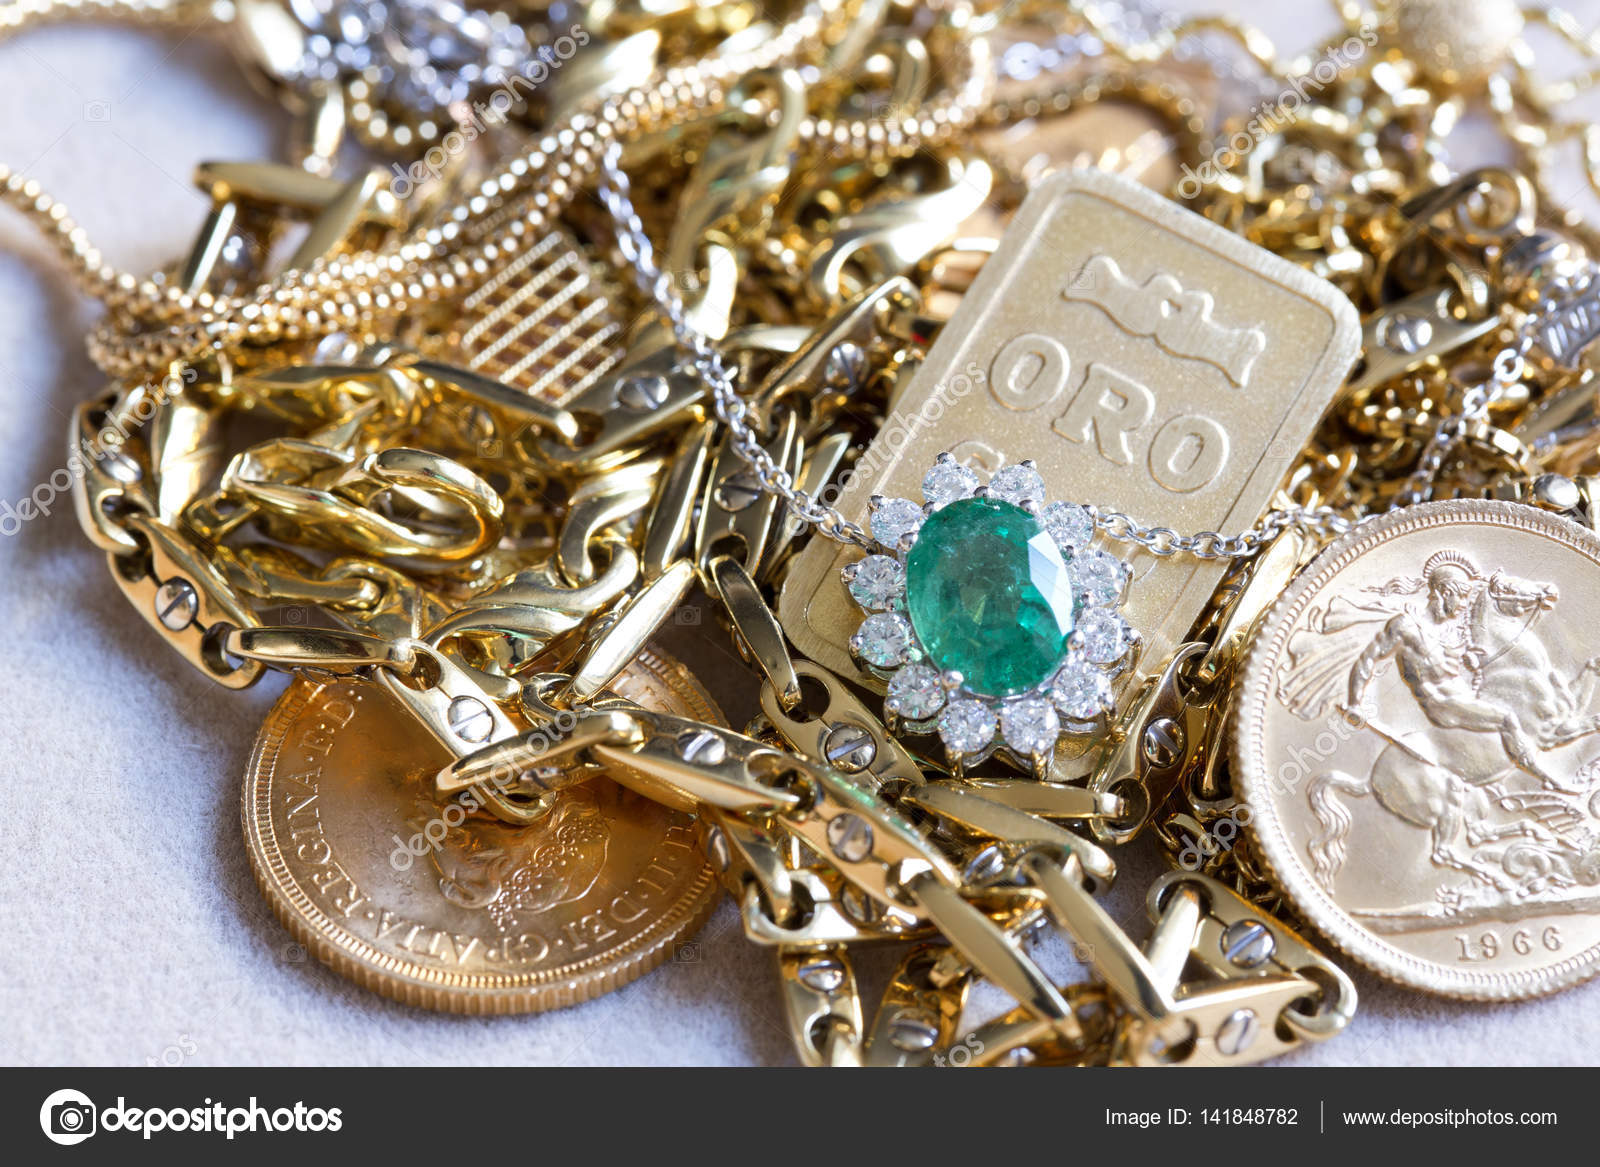 *** Sperem *** 15th sezione _ - Pagina 40 Depositphotos_141848782-stock-photo-pile-of-precious-jewelery